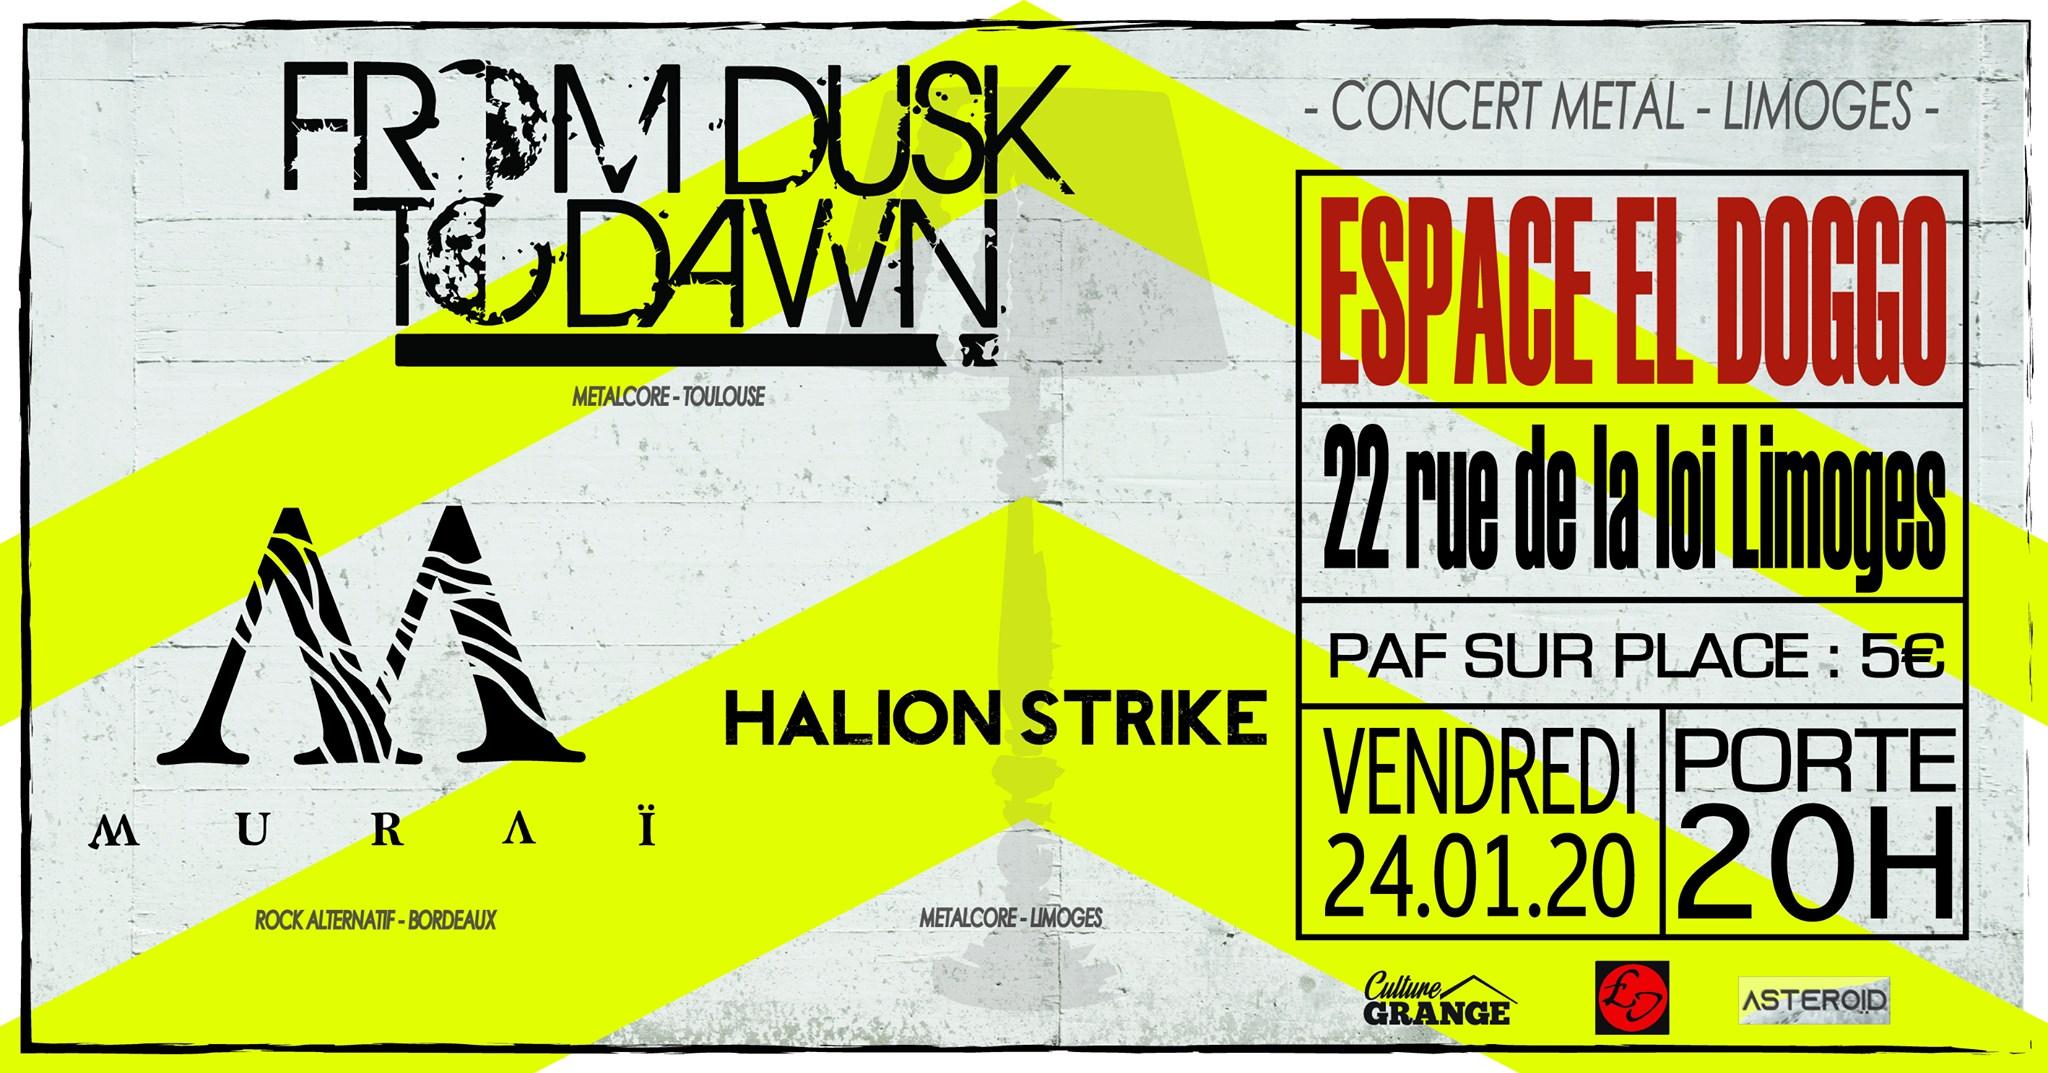 Limoges : From Dusk to Dawn + Muraï + Halion Strike